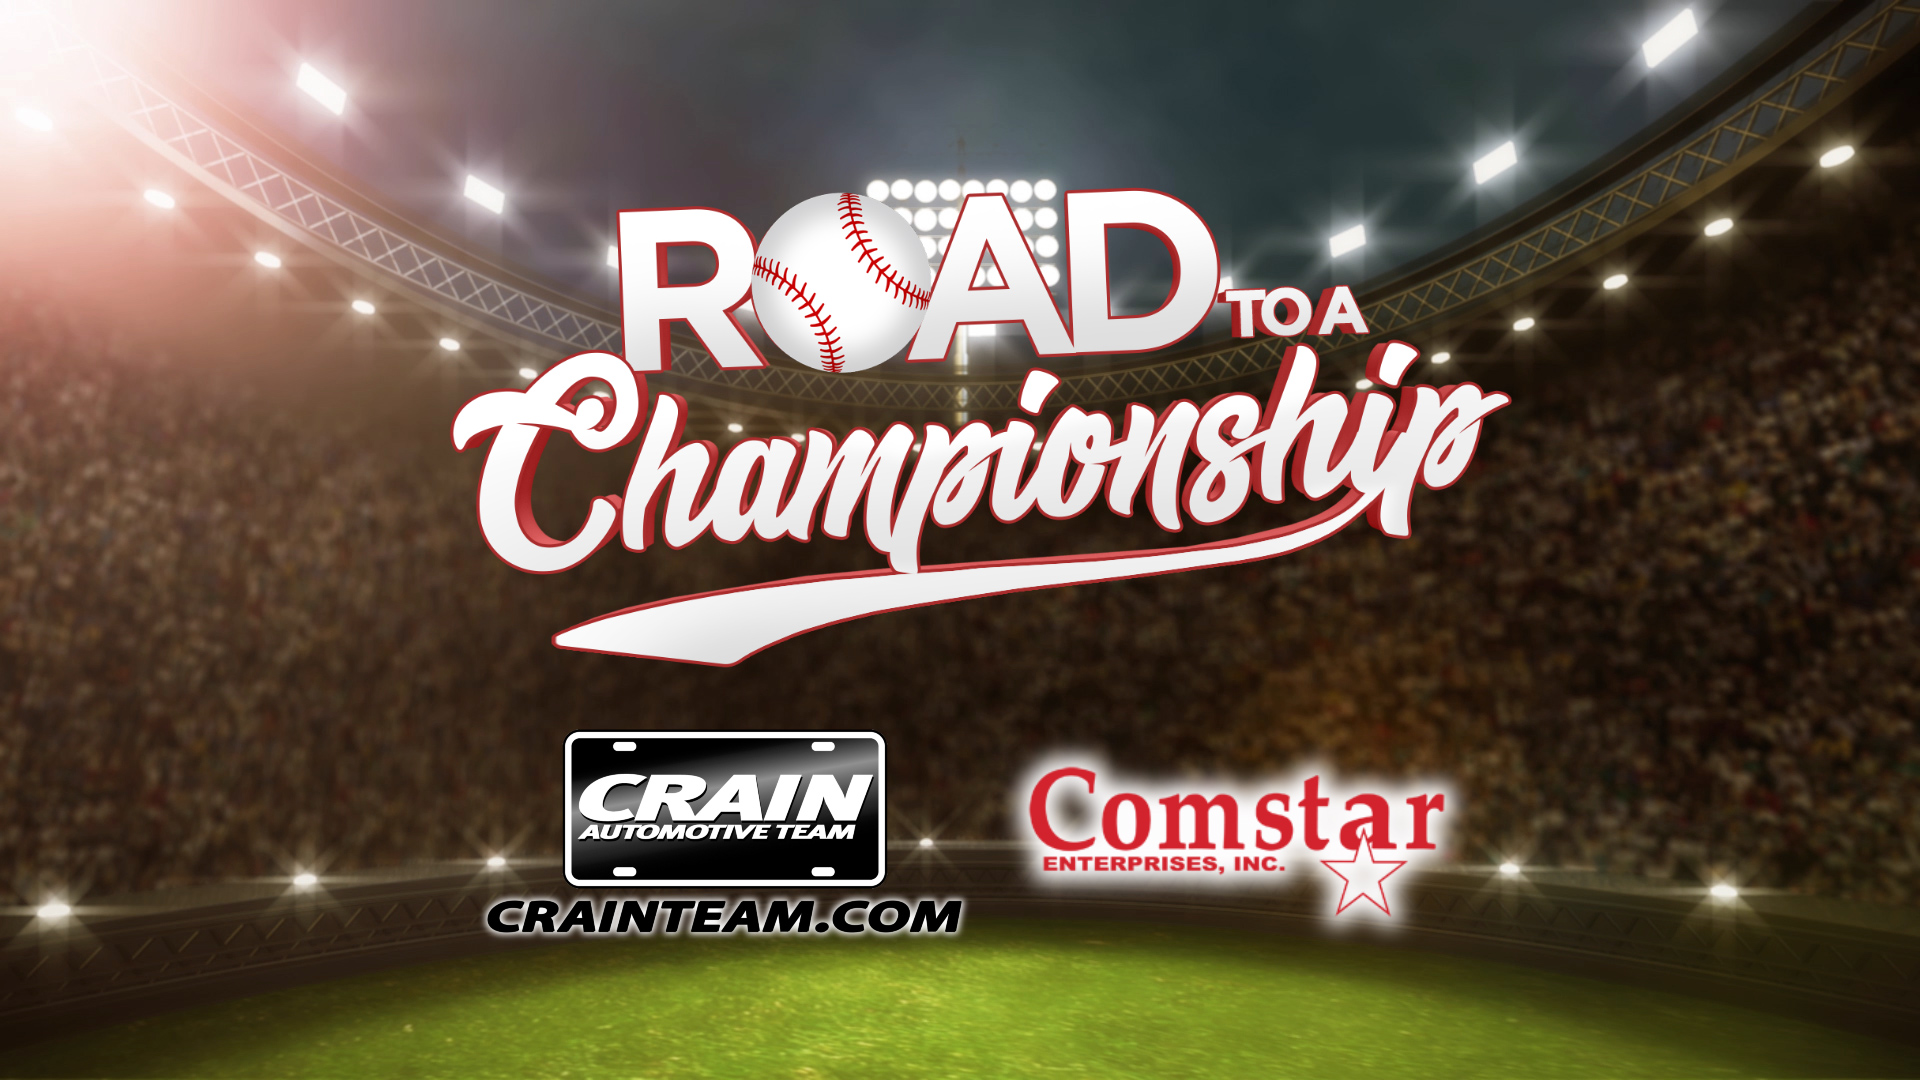 Omaha road to a championship.jpg